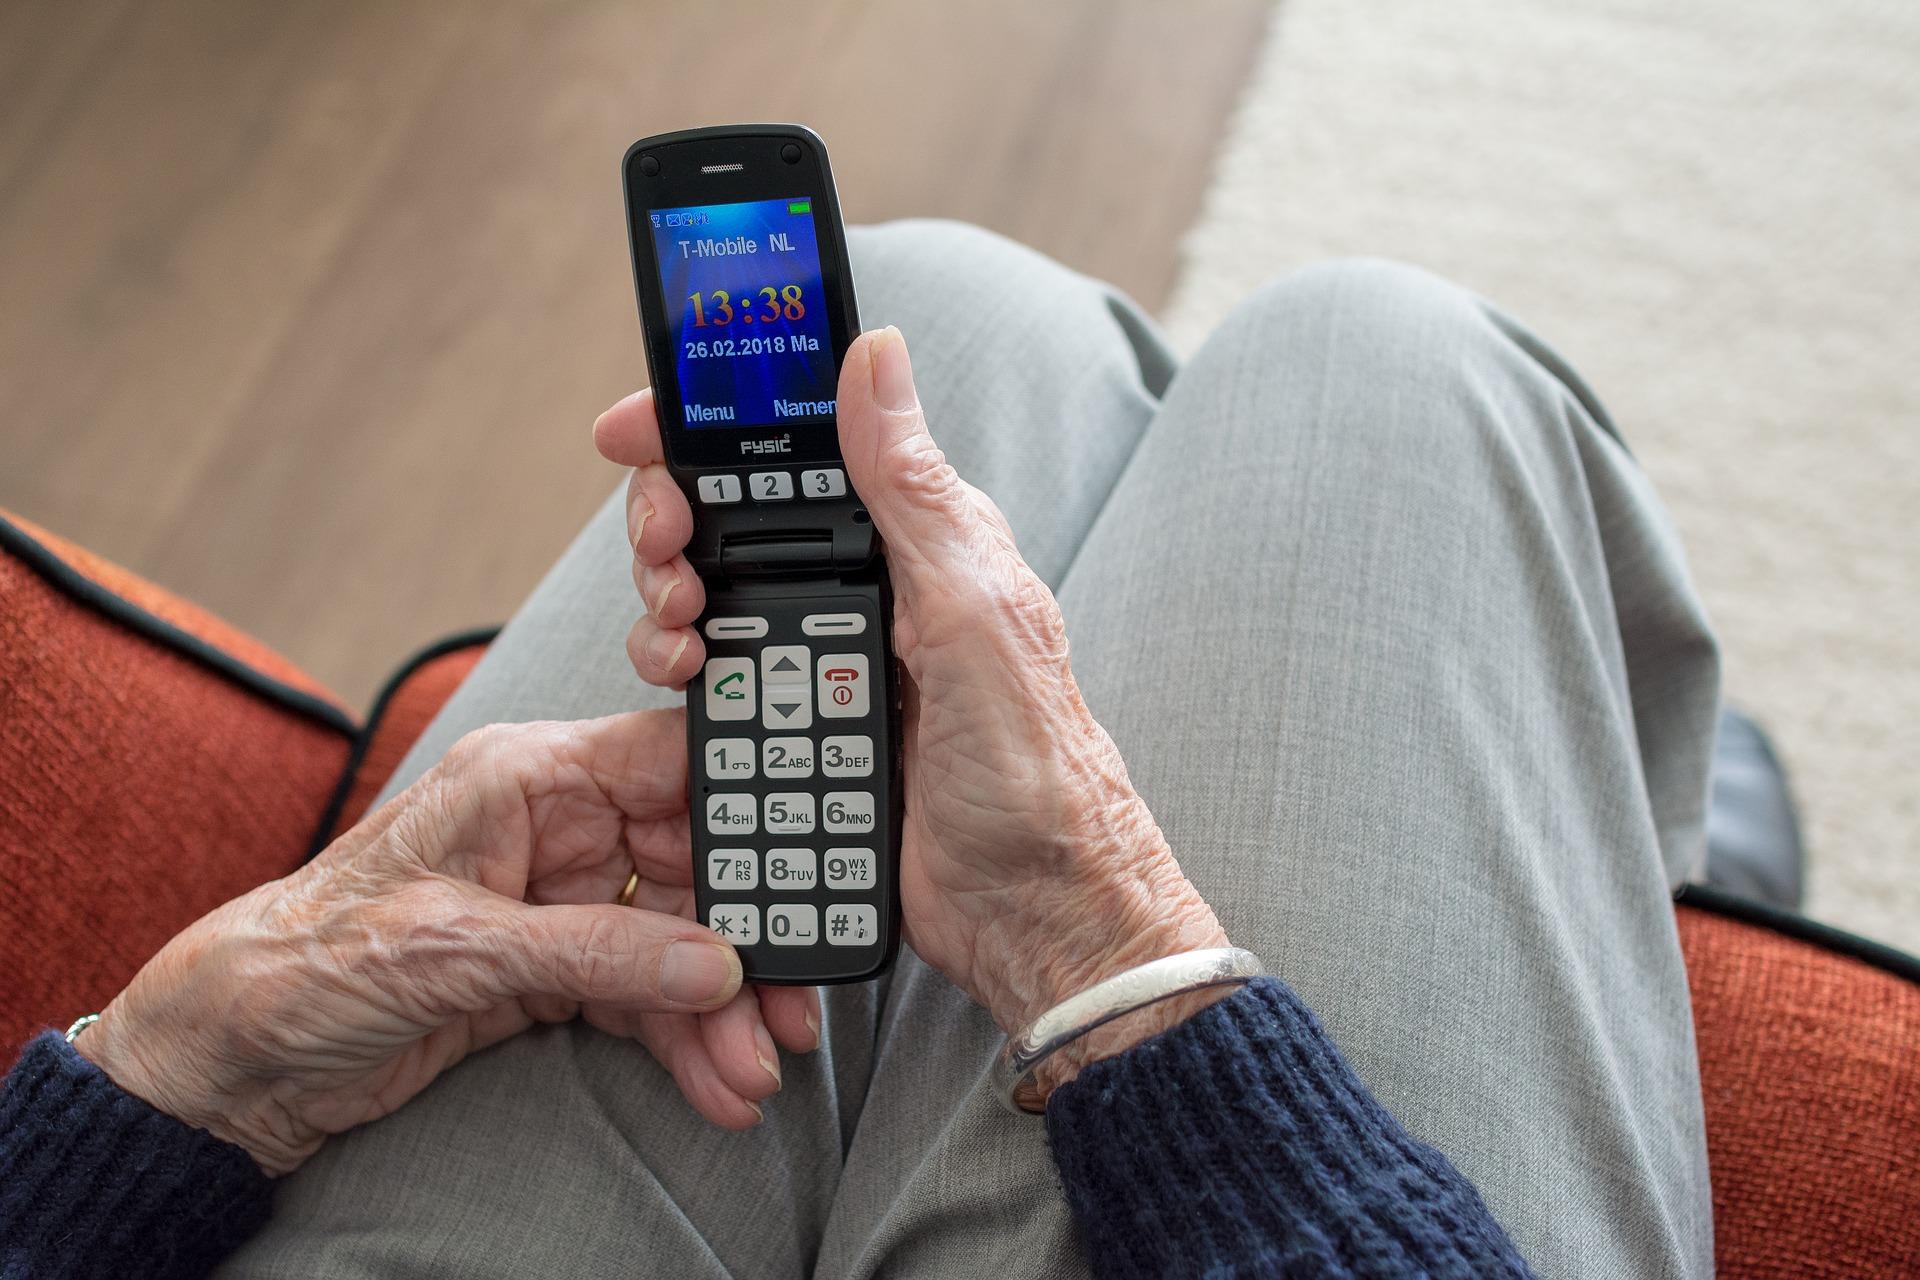 Scam Alert: Meals on Wheels Phone Scam